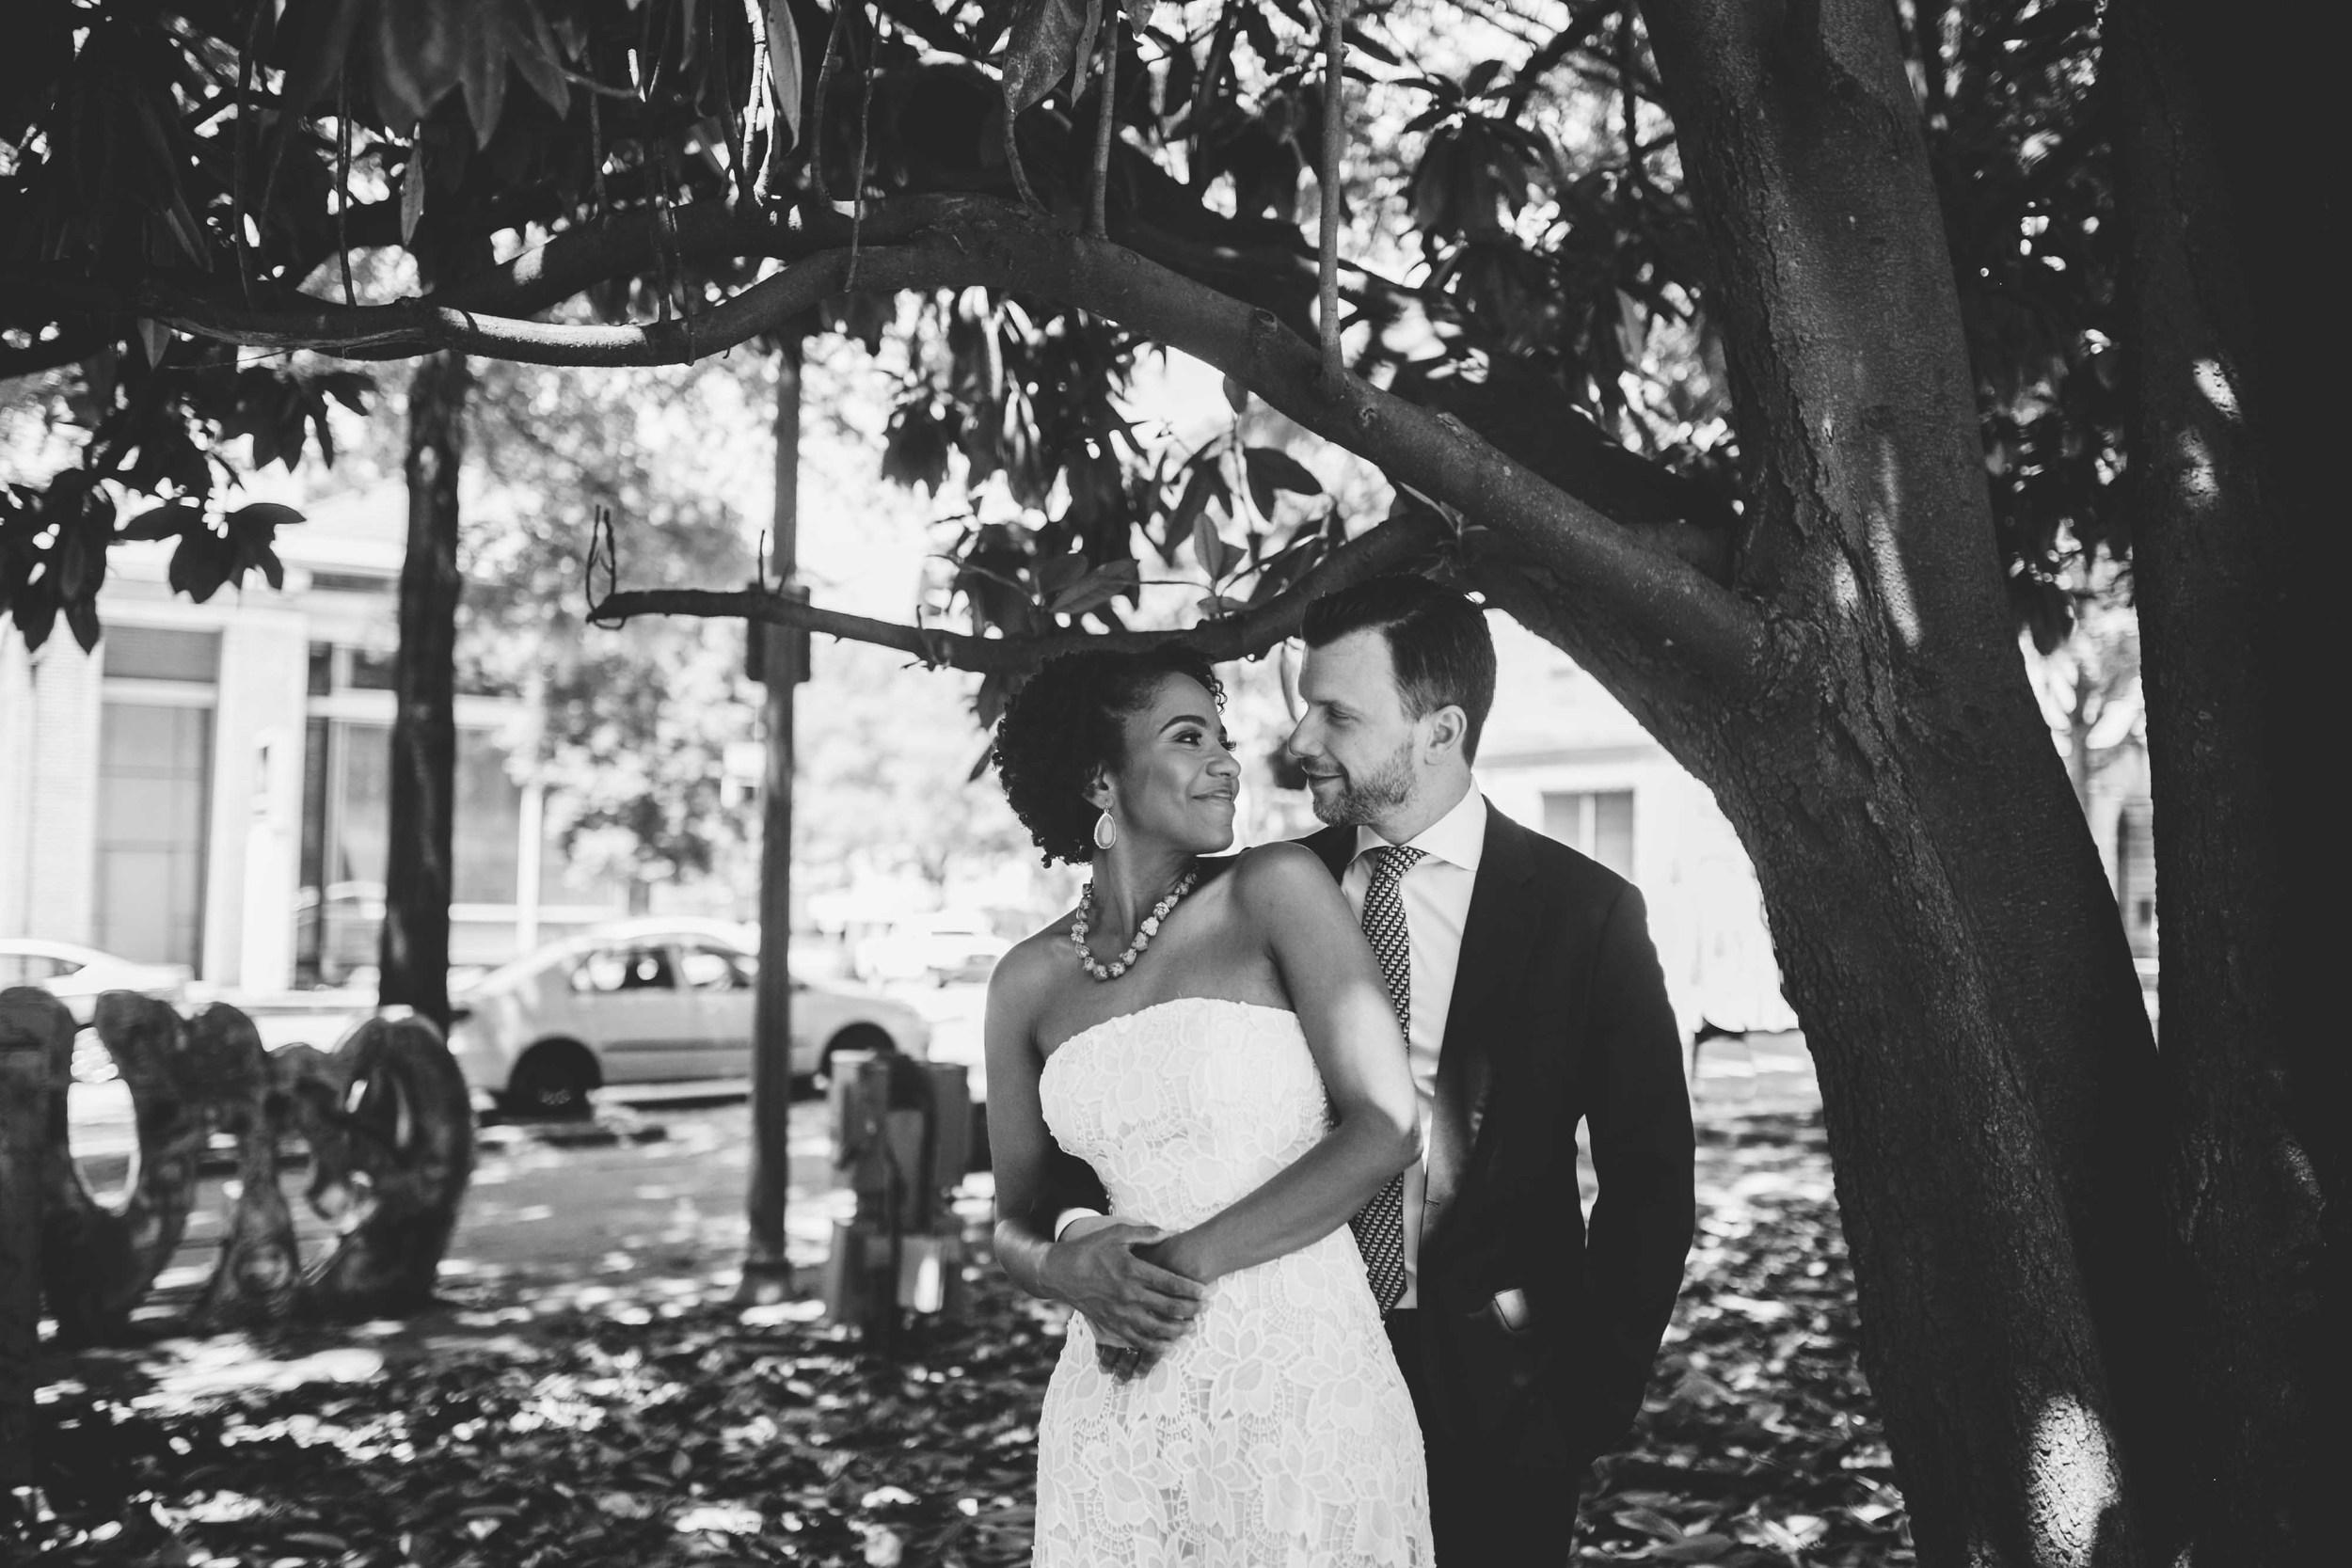 Dekalb-County-Courthouse-Wedding-Photos-Kiyah-C-Photography-48.jpg